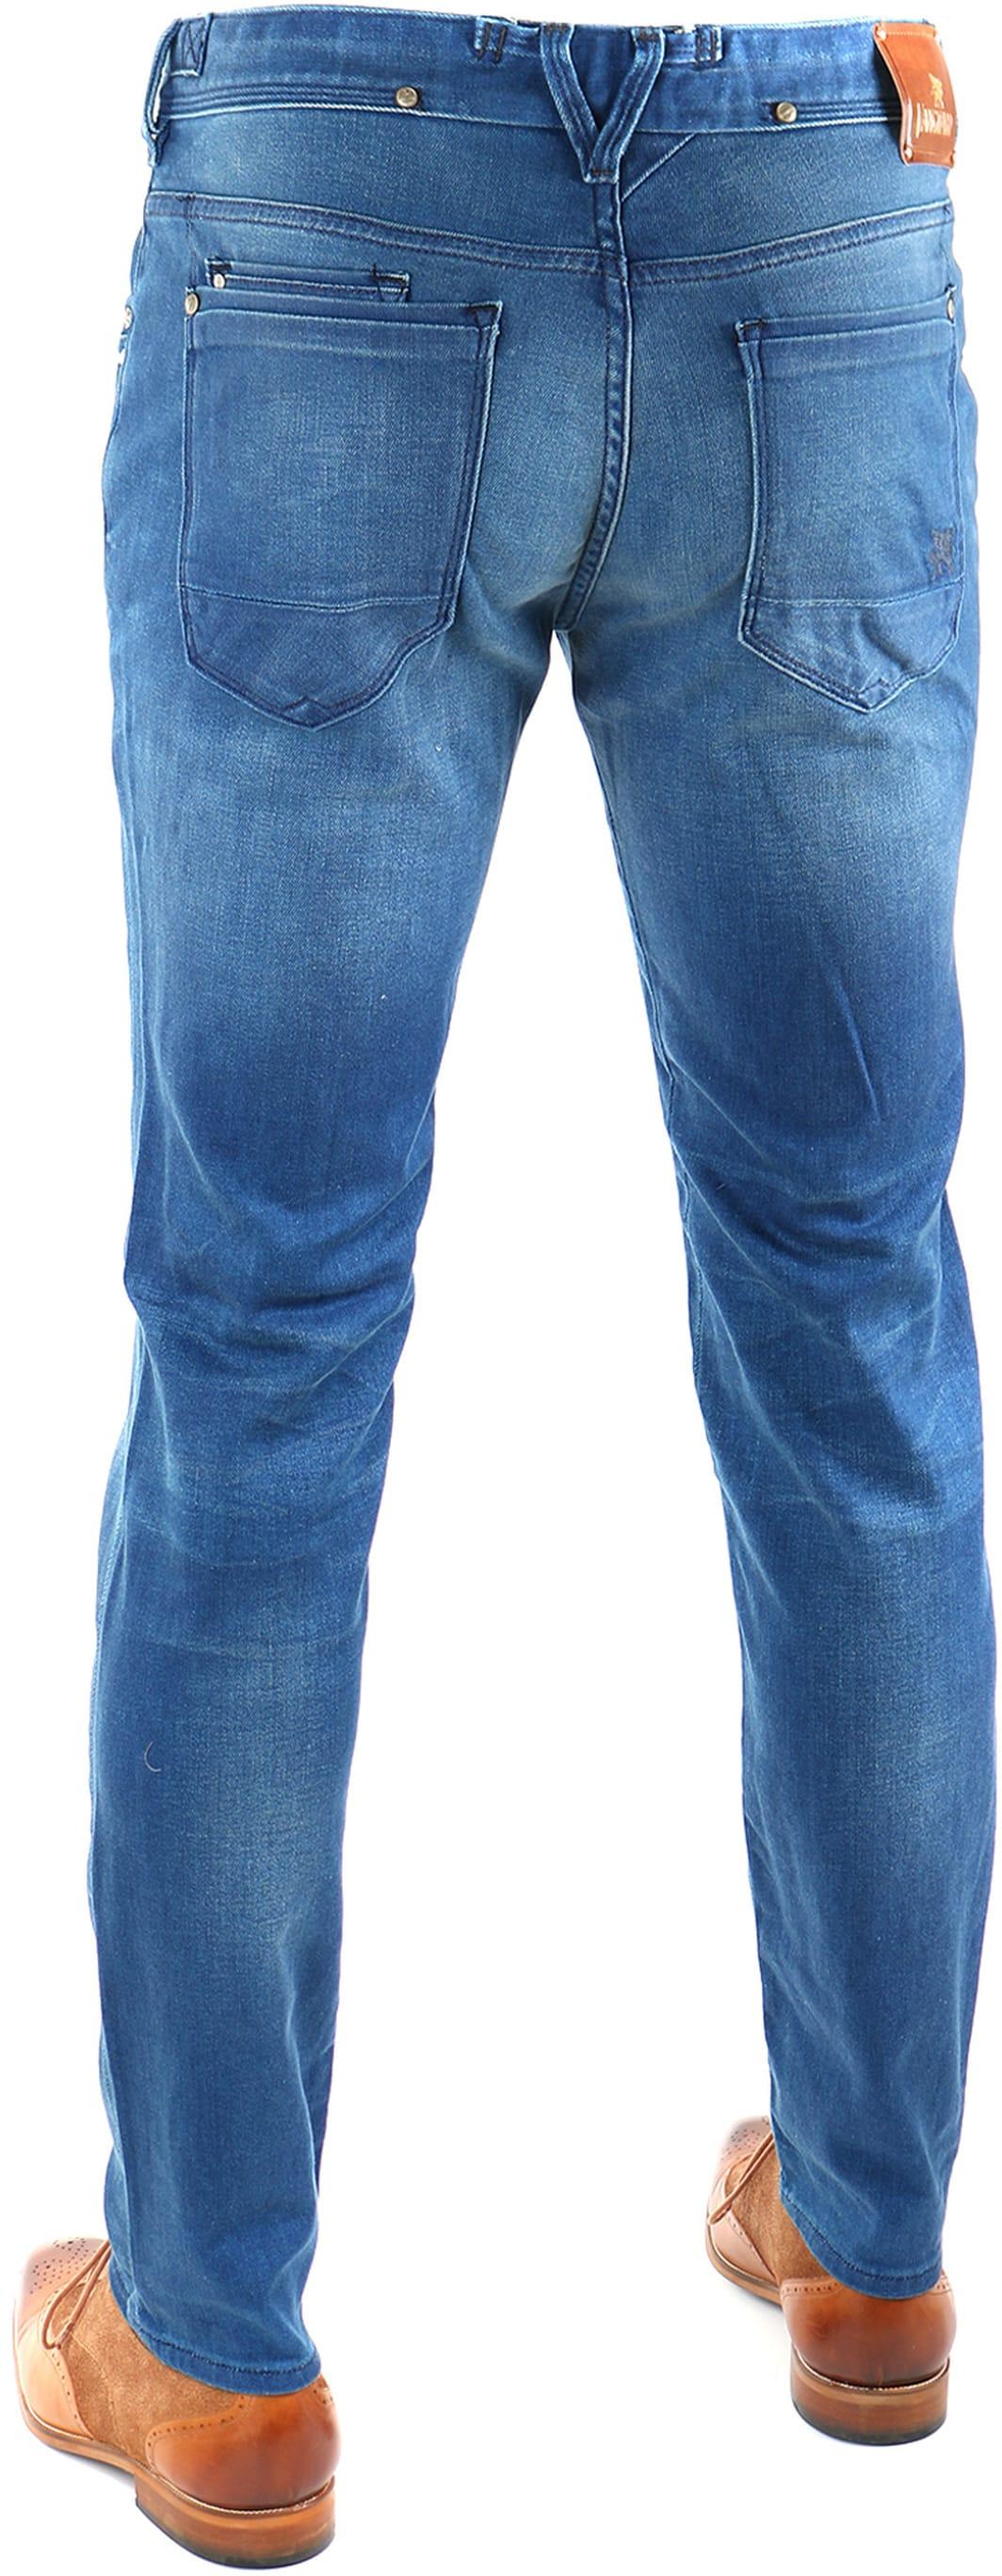 Vanguard V8 Jeans Blau foto 4